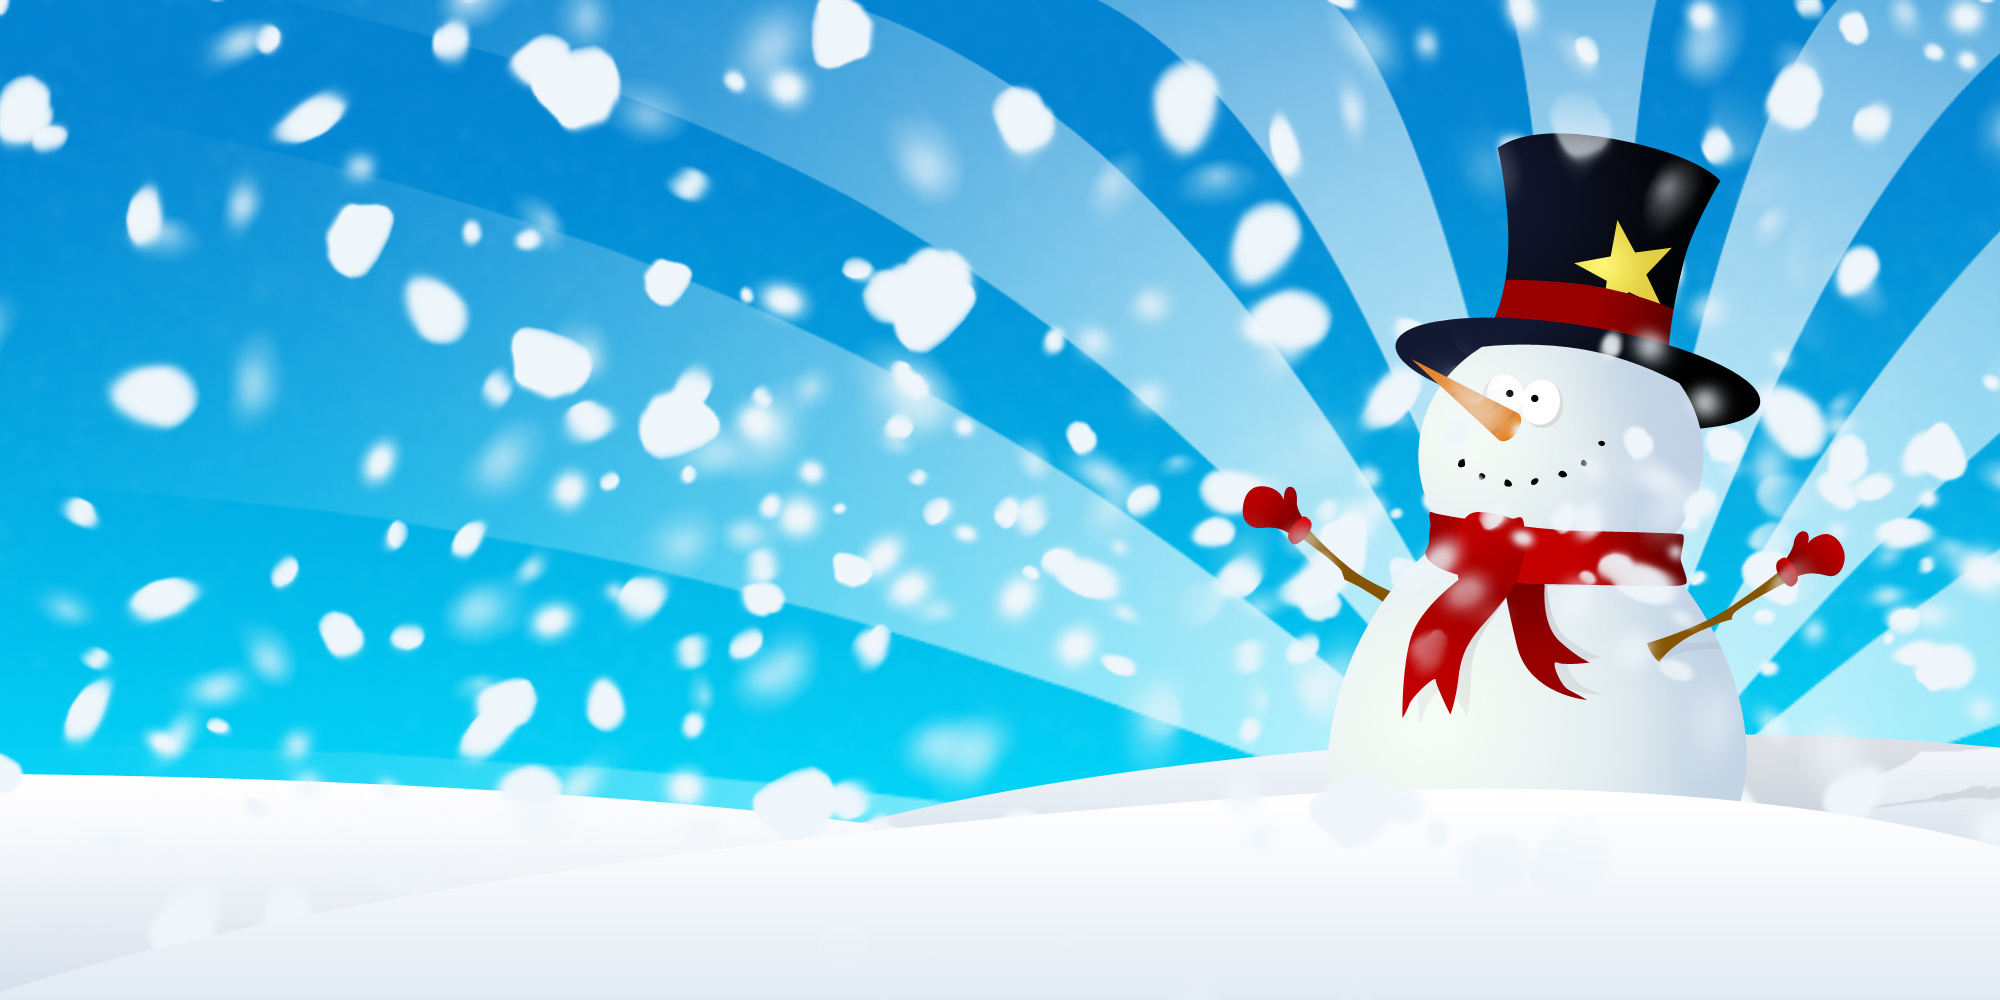 Snowman Wallpaper Fullscreen HD